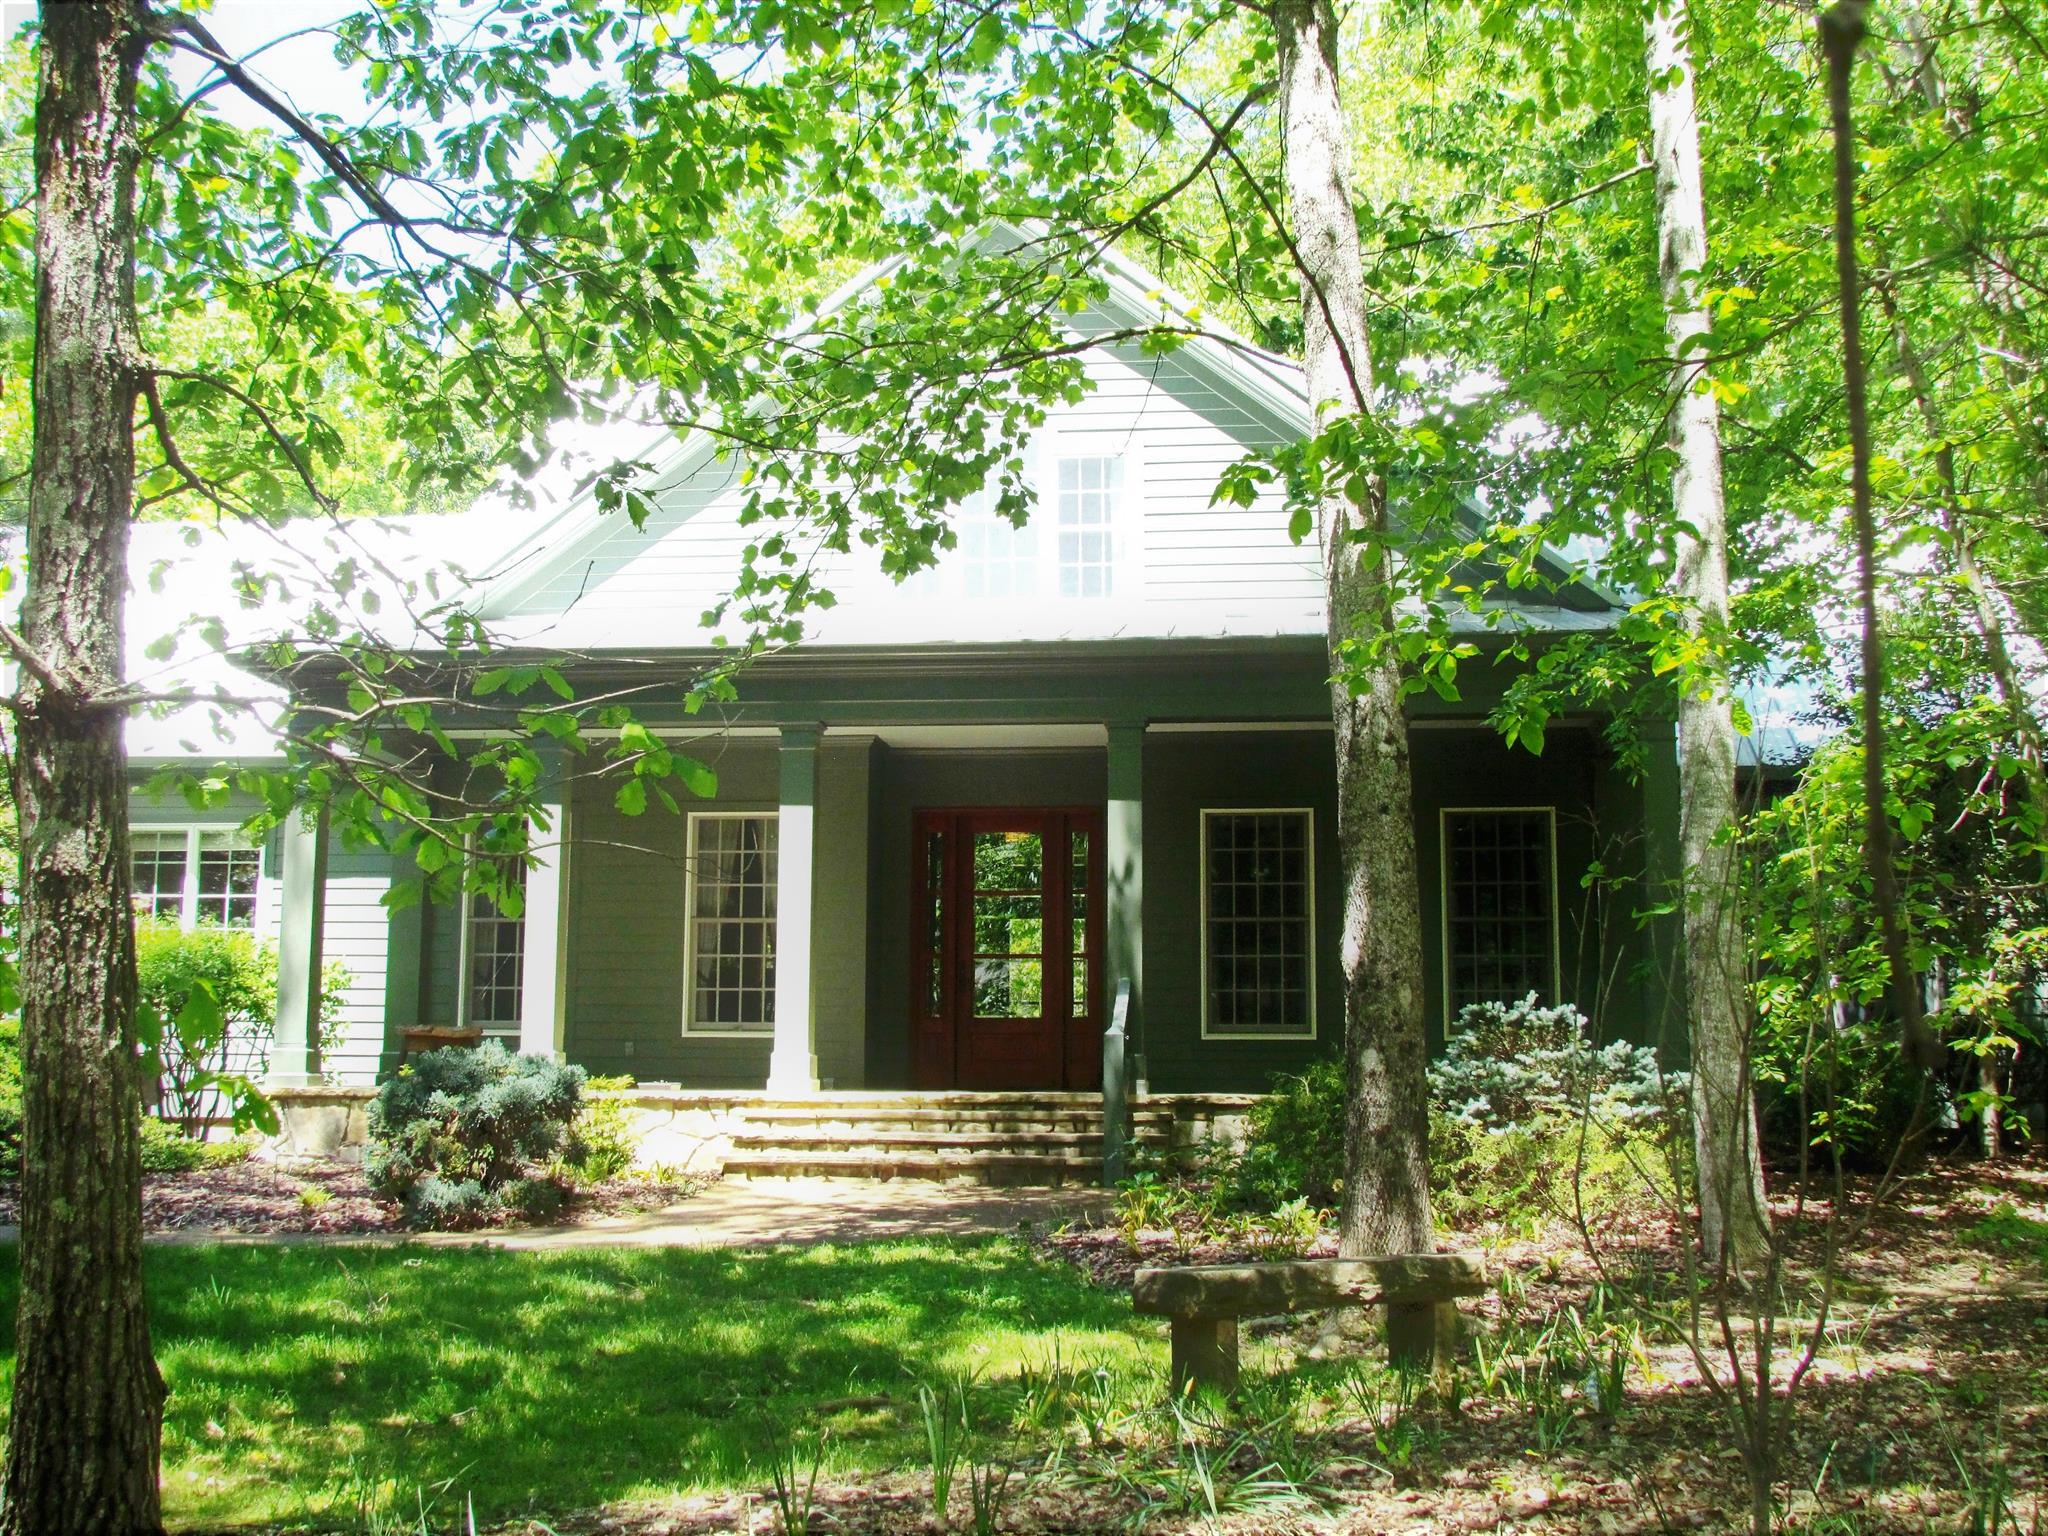 426 Wiggins Creek Dr, Sewanee, TN 37375